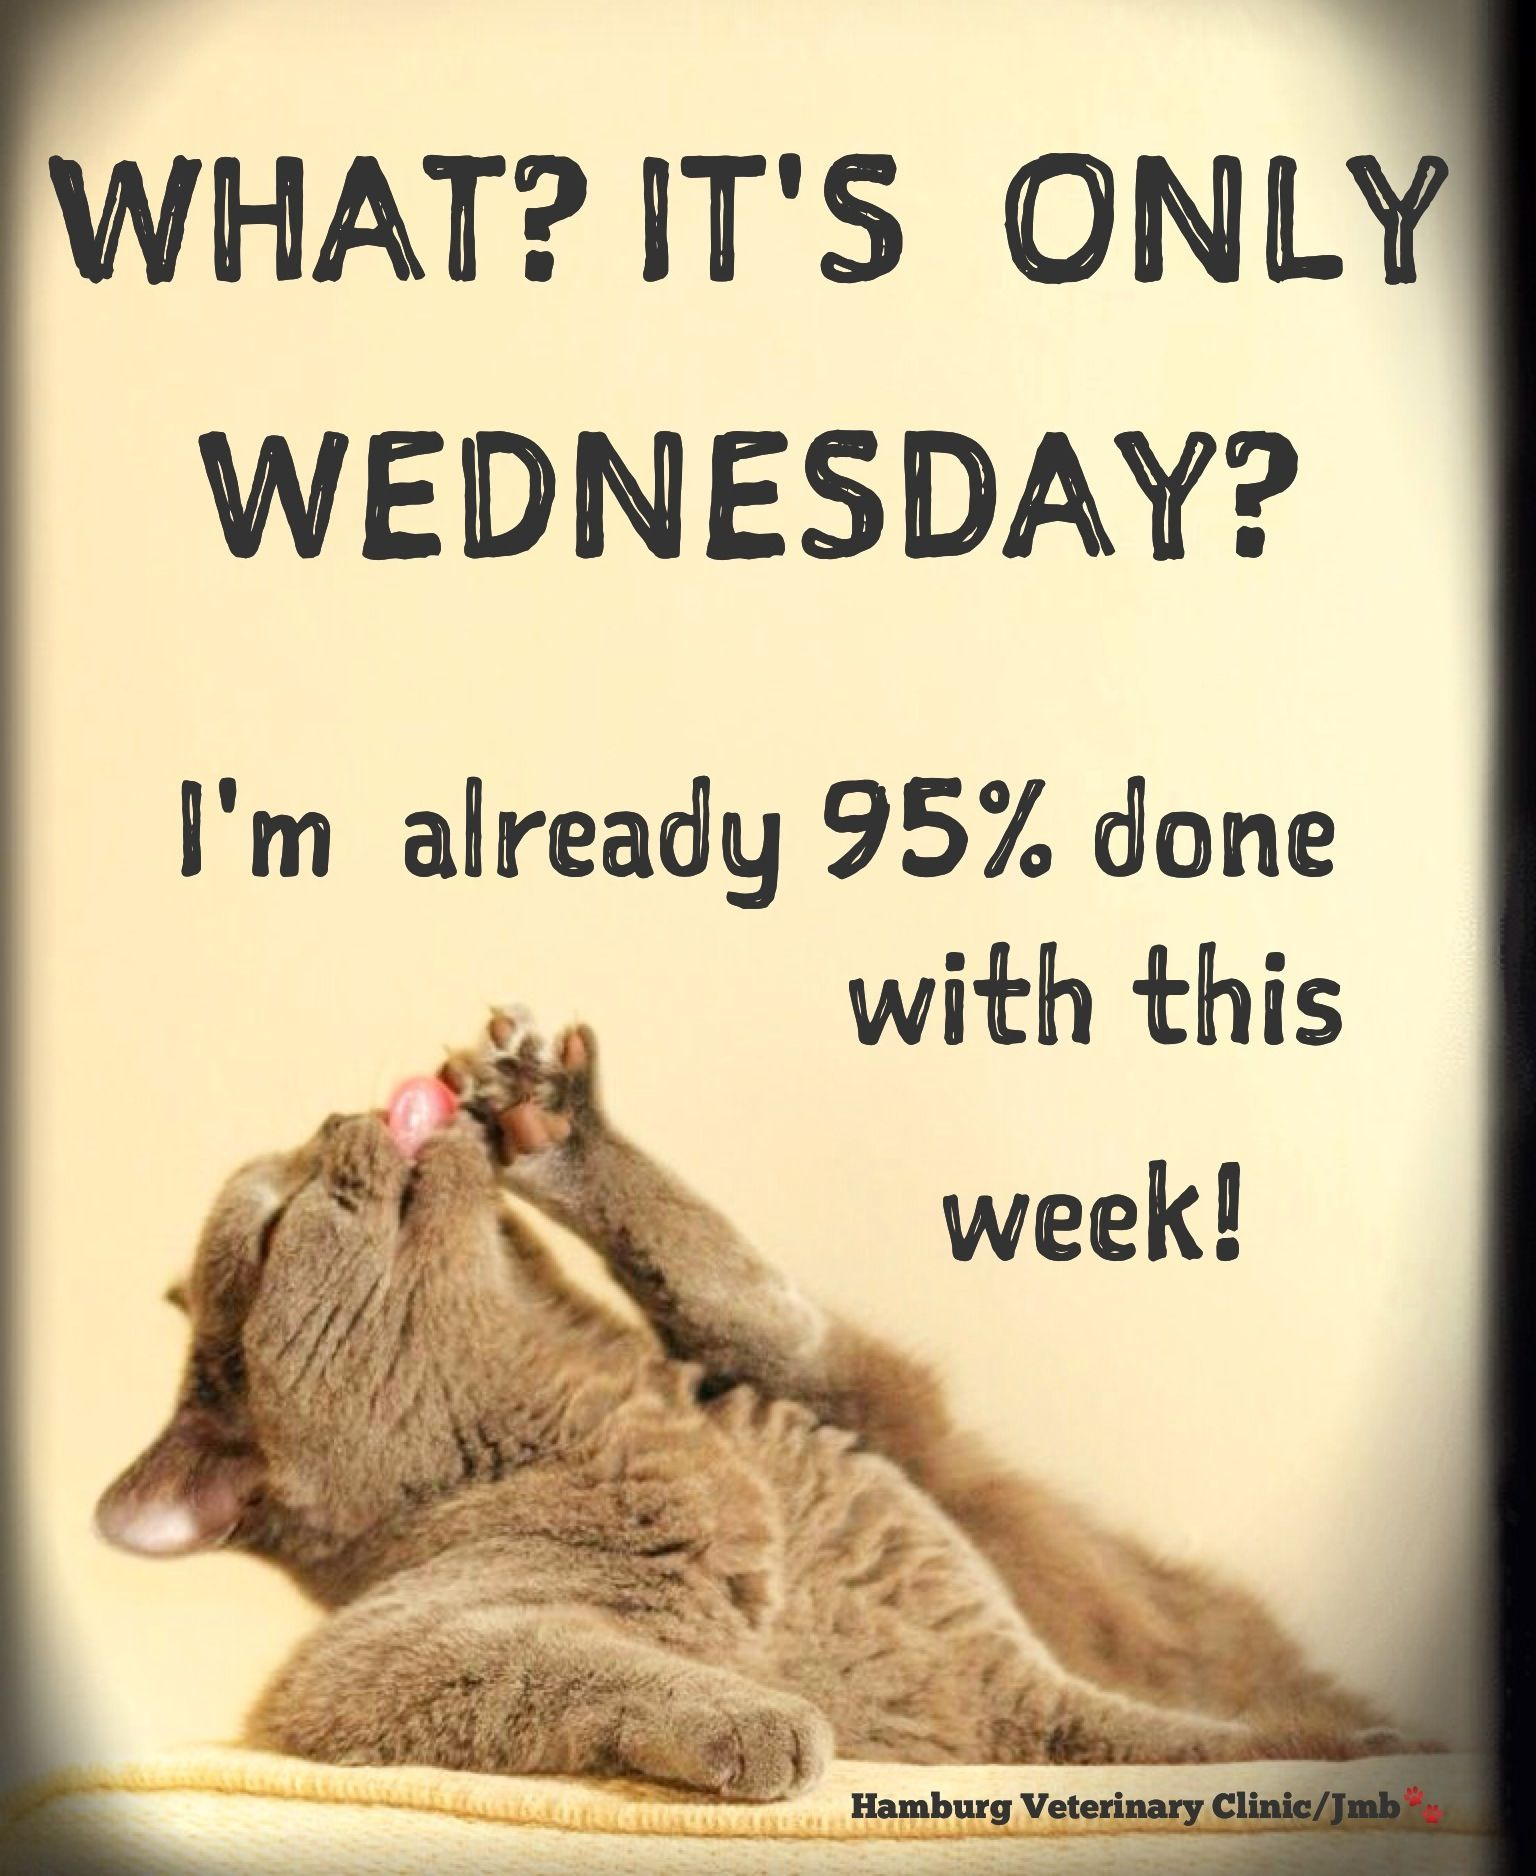 Wednesday Humor Happy Hump Day! 🐪 Mid week Halfway